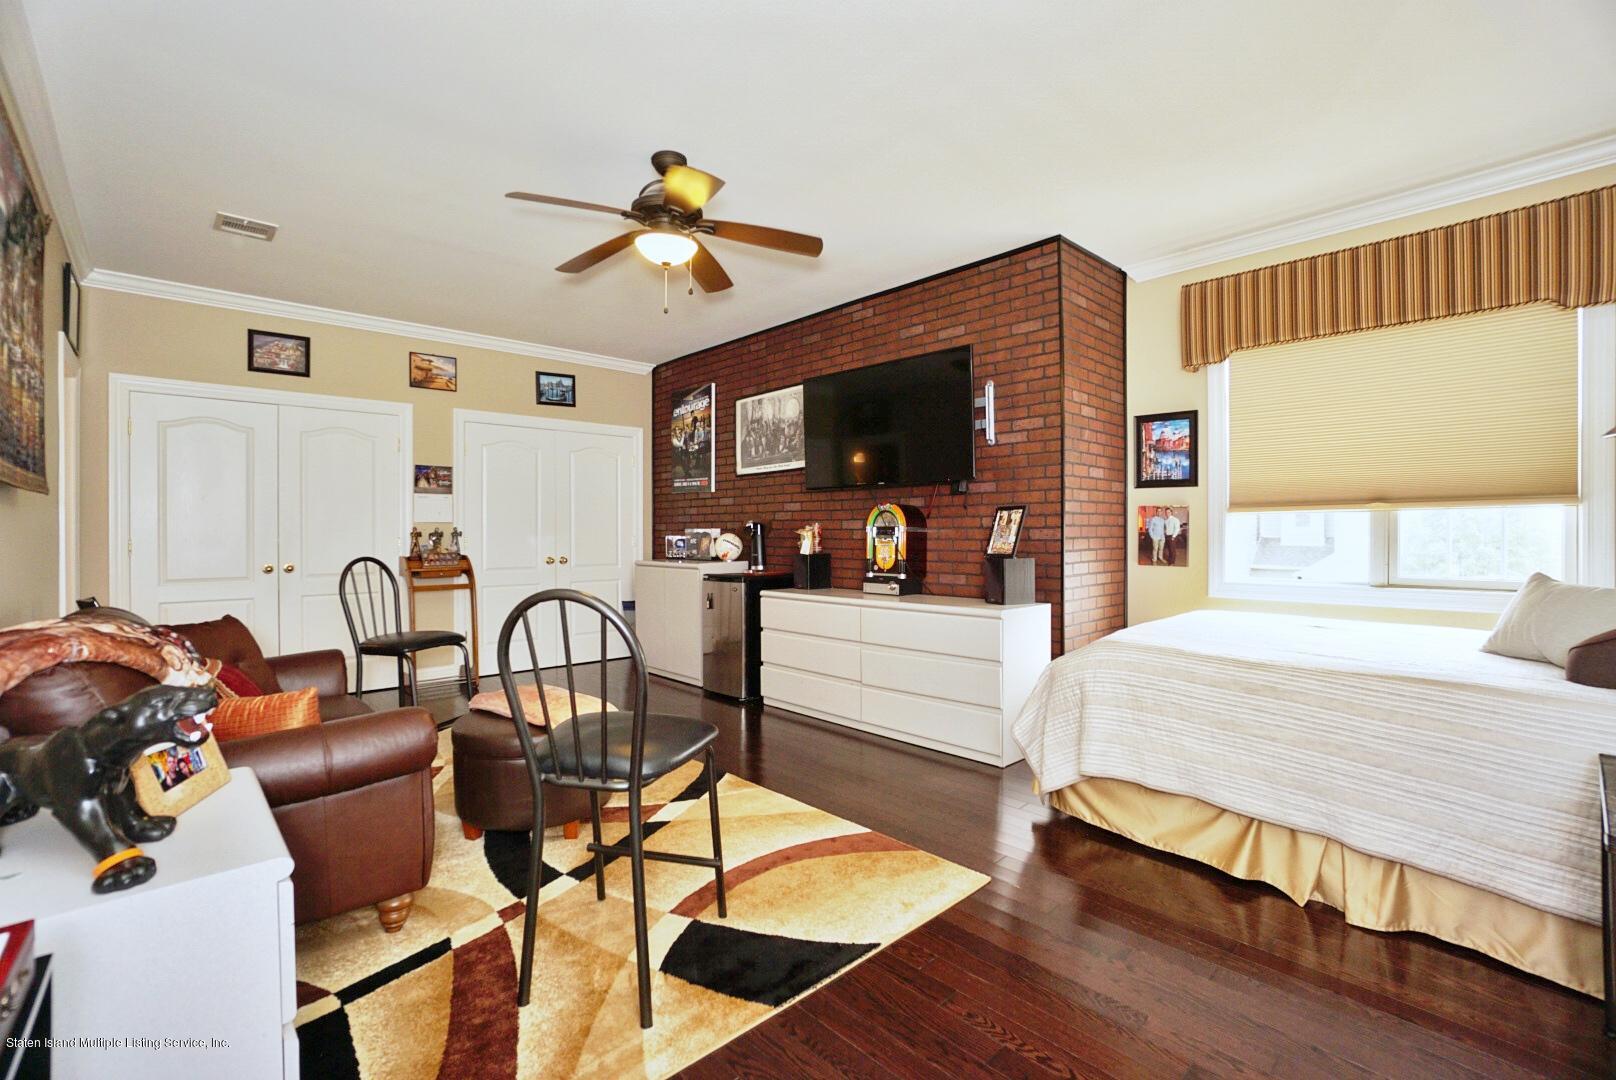 Single Family - Attached 80 Pilot Lane  Staten Island, NY 10309, MLS-1140636-13